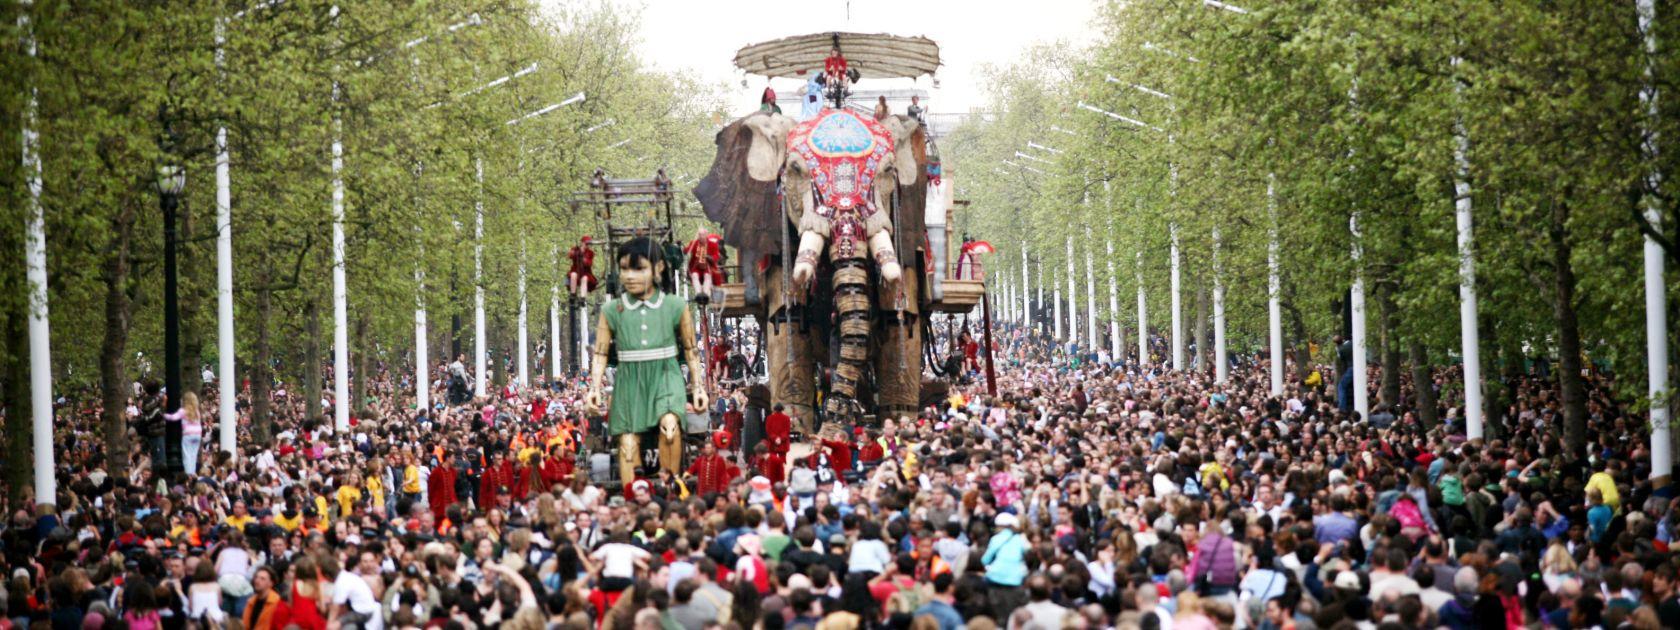 The Sultan's Elephant, Royal de Luxe, 2006. Produced by Artichoke in London. Photo by Matthew Andrews.